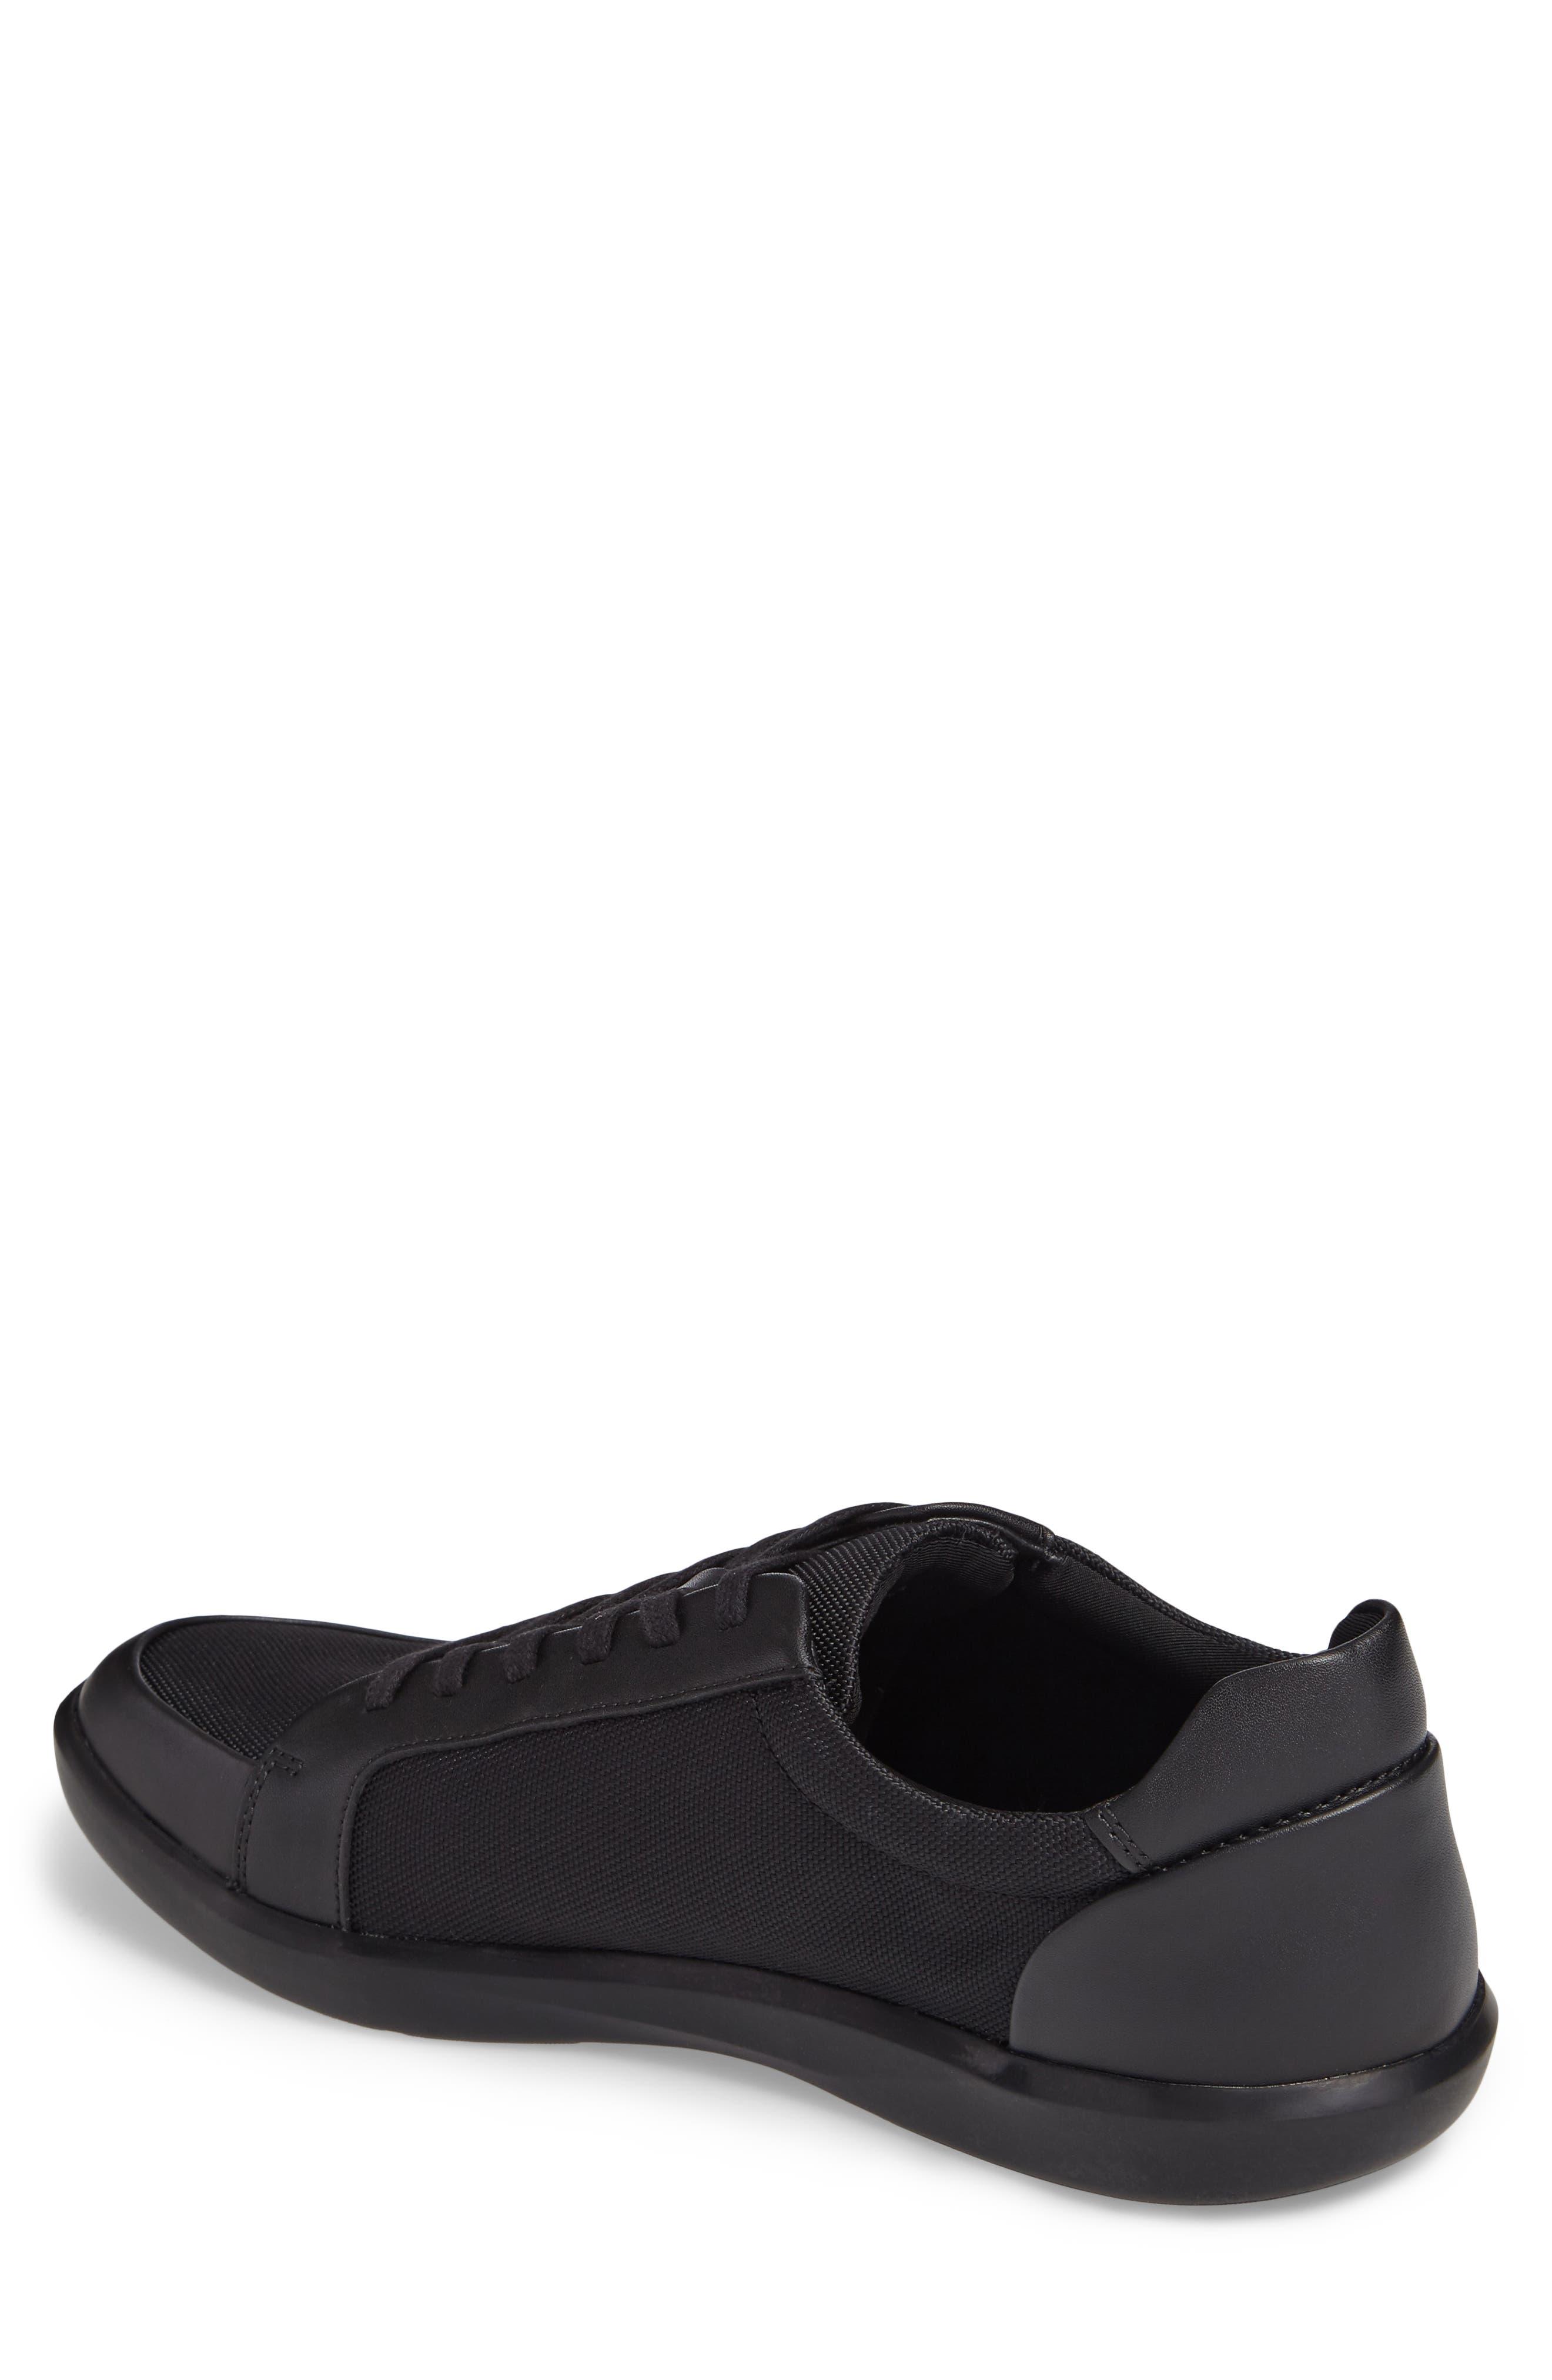 Alternate Image 2  - Calvin Klein Macabee Sneaker (Men)